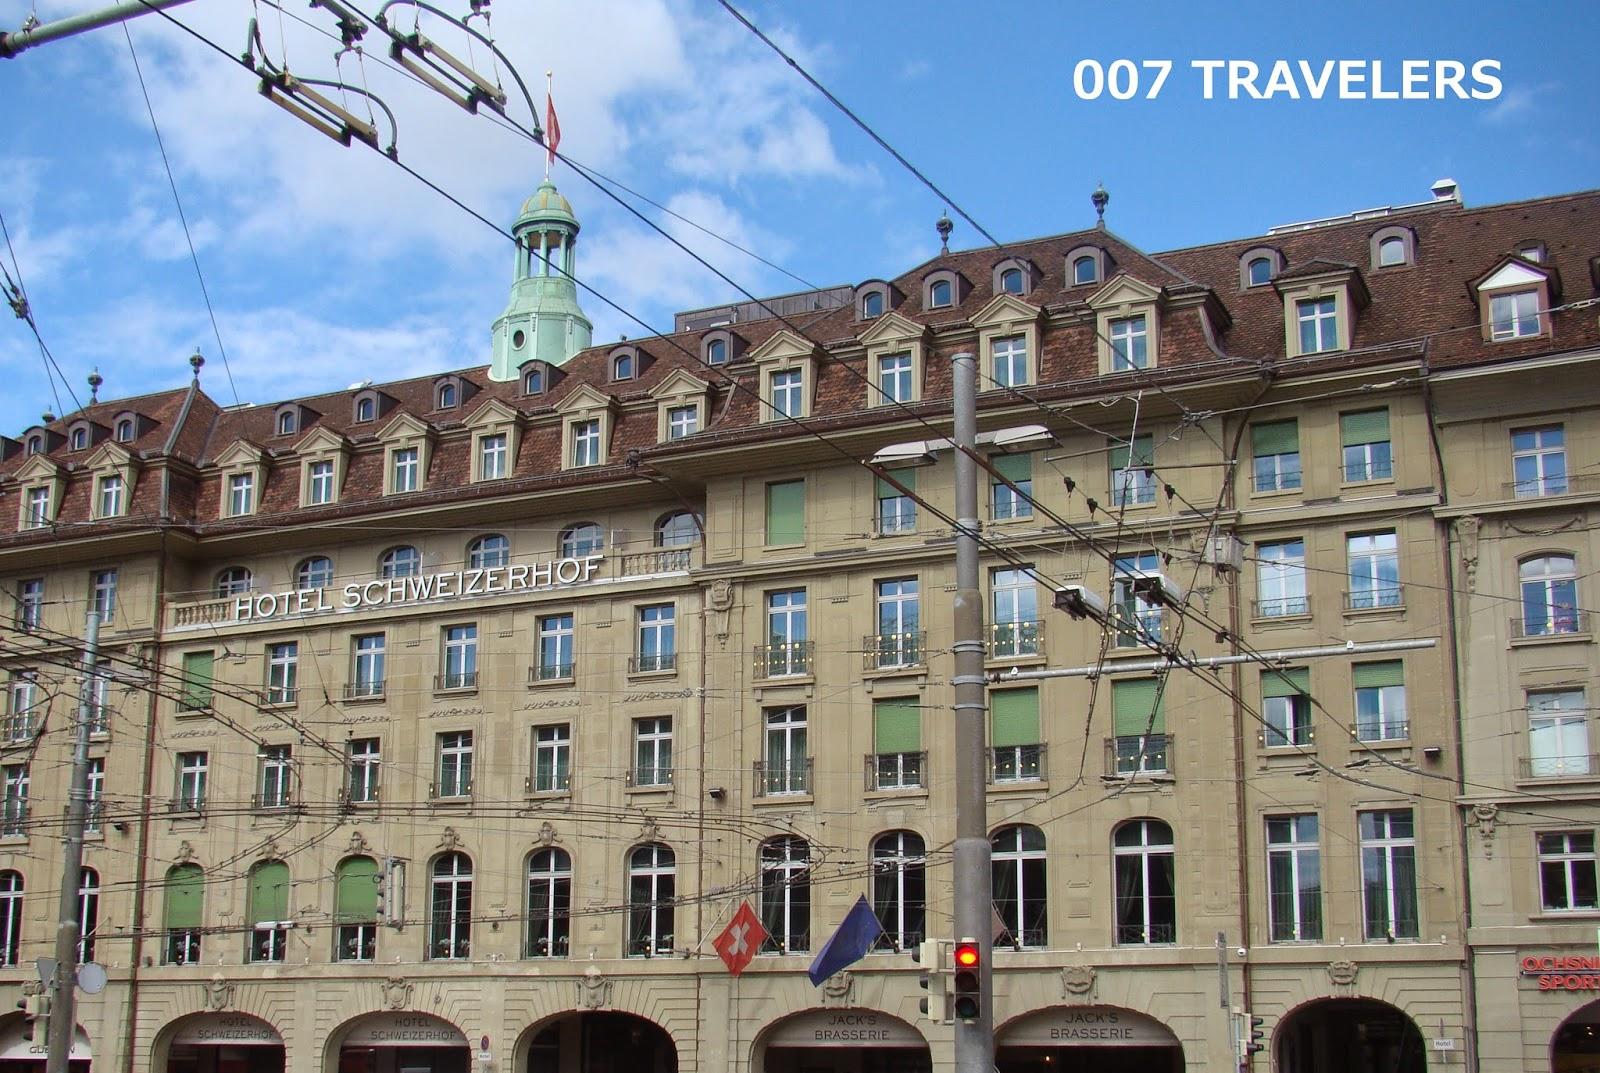 Later we entered fabulous hotel schweizerhof bern